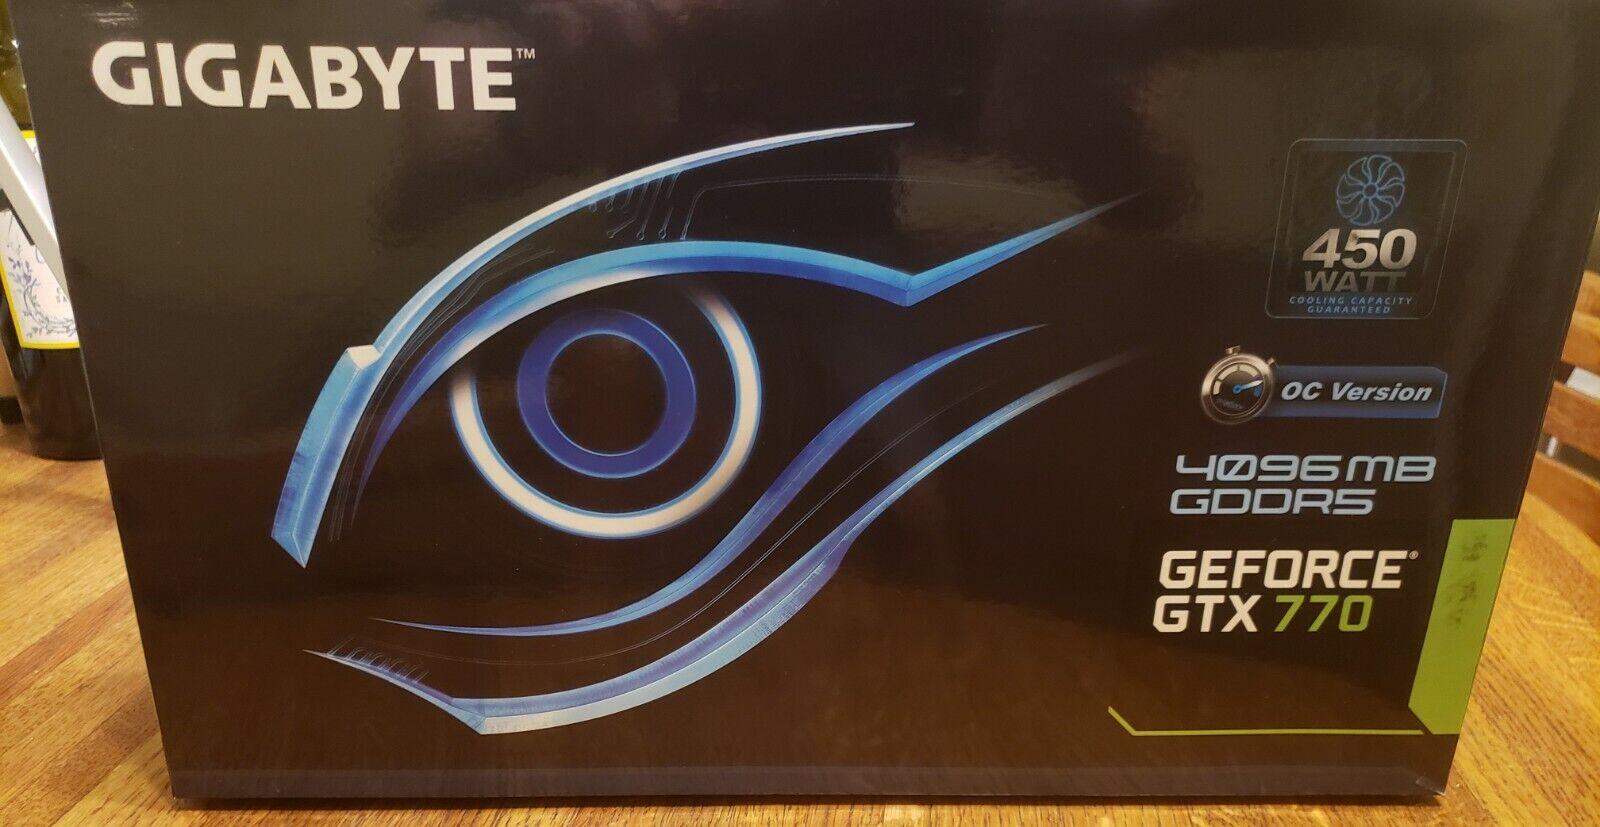 Gigabyte Geforce GTX 770 Box Only